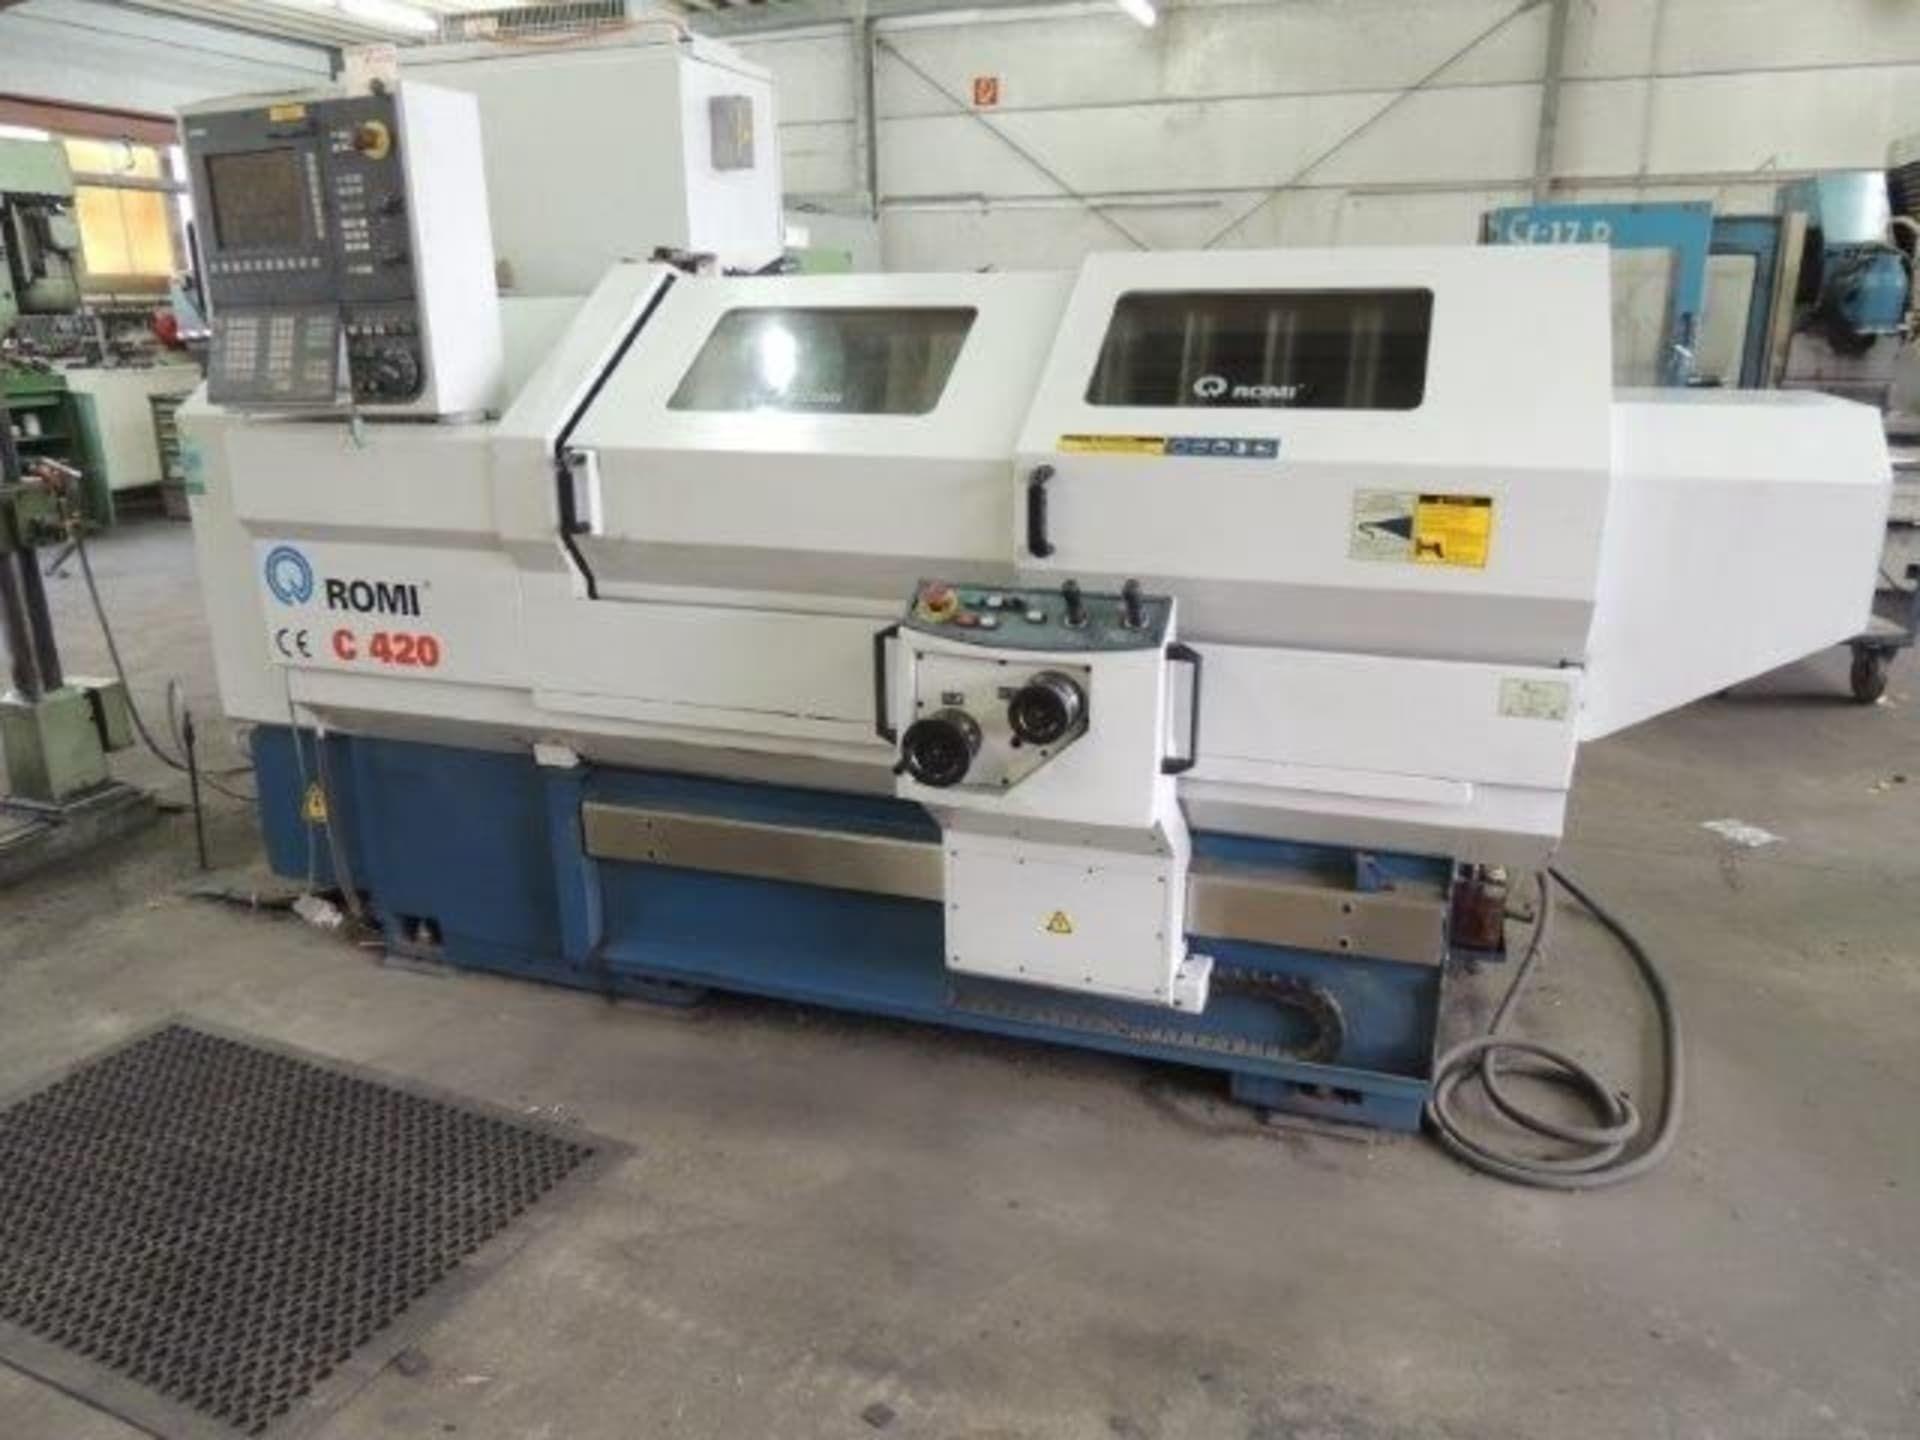 ROMI C 420 CNC Drehmaschine